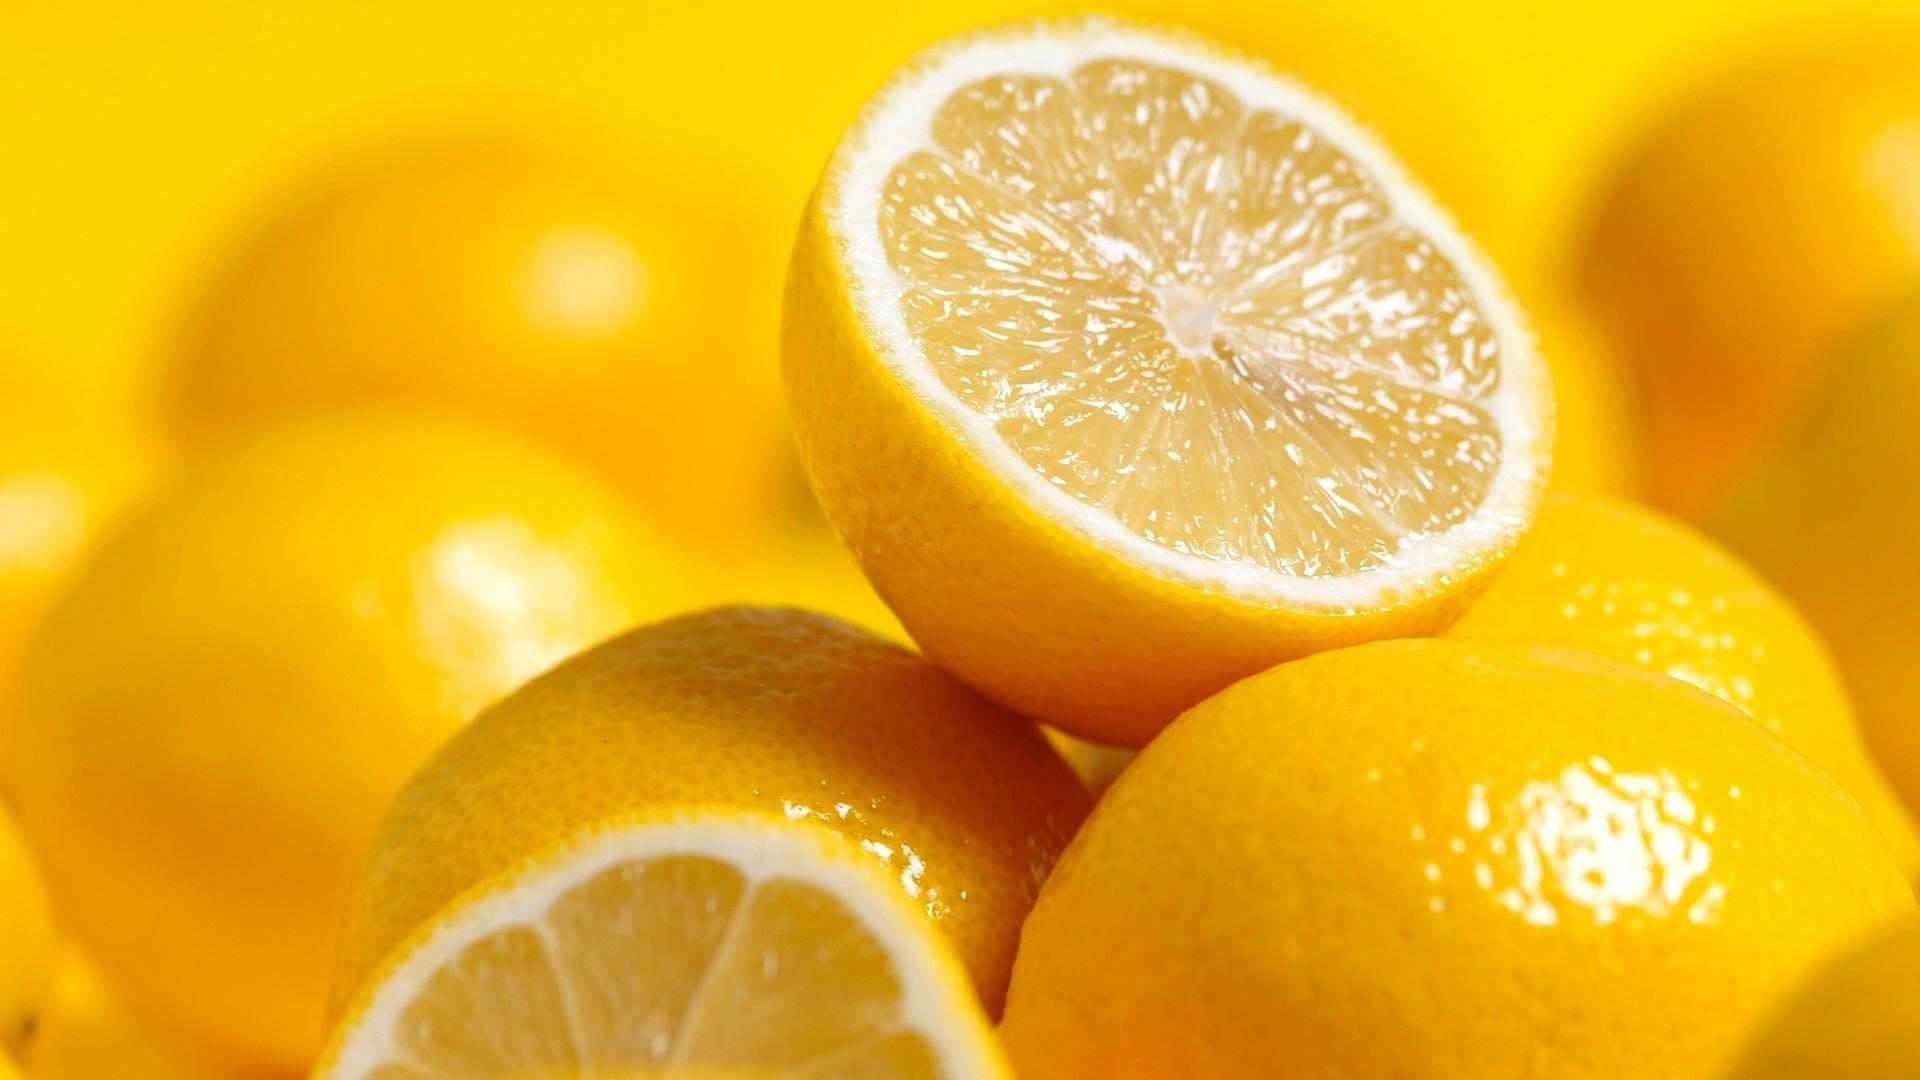 Lemon Hd Wallpaper Background Image 1920x1080 Id